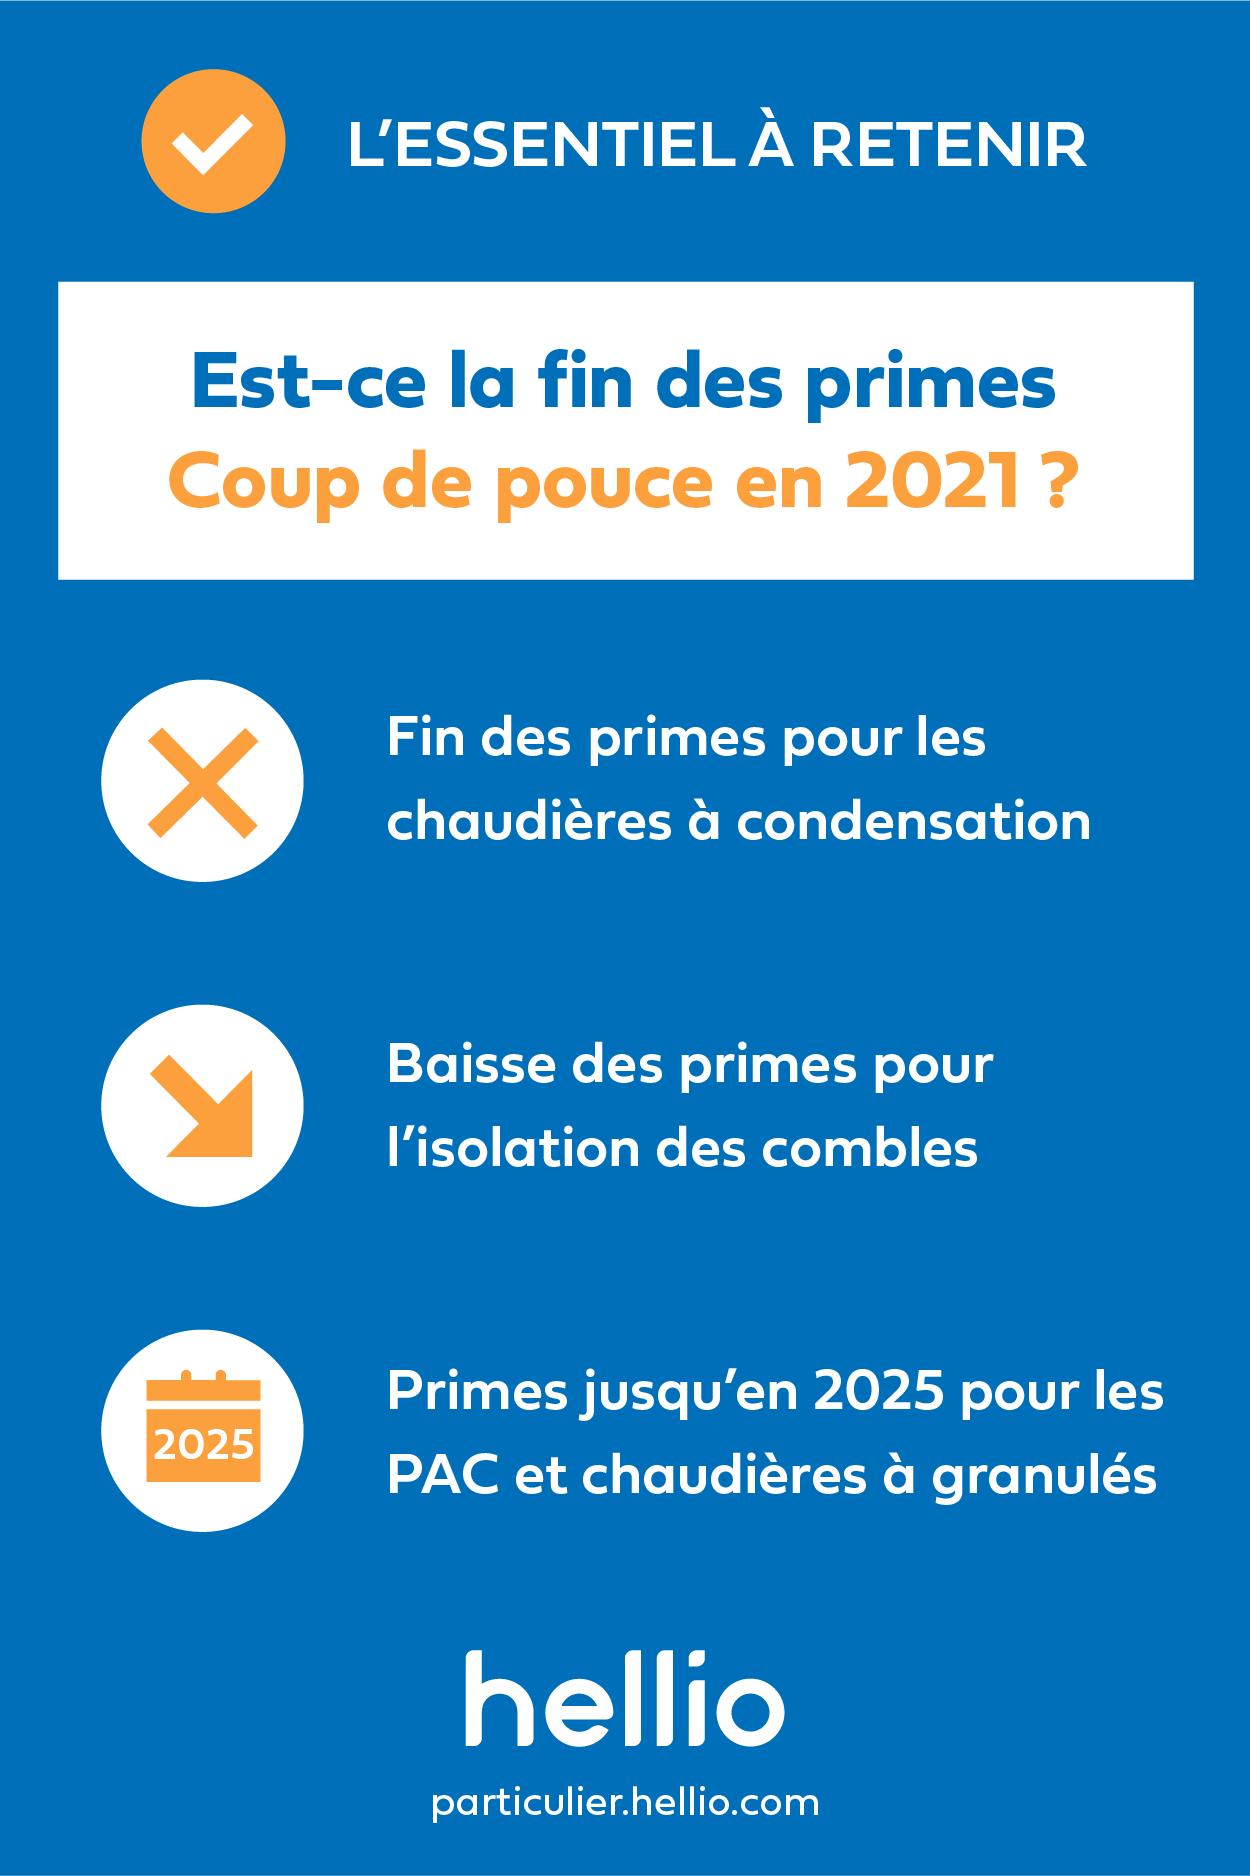 infographie-hellio-essentiel-retenir-fin-primes-coup-pouce-2021